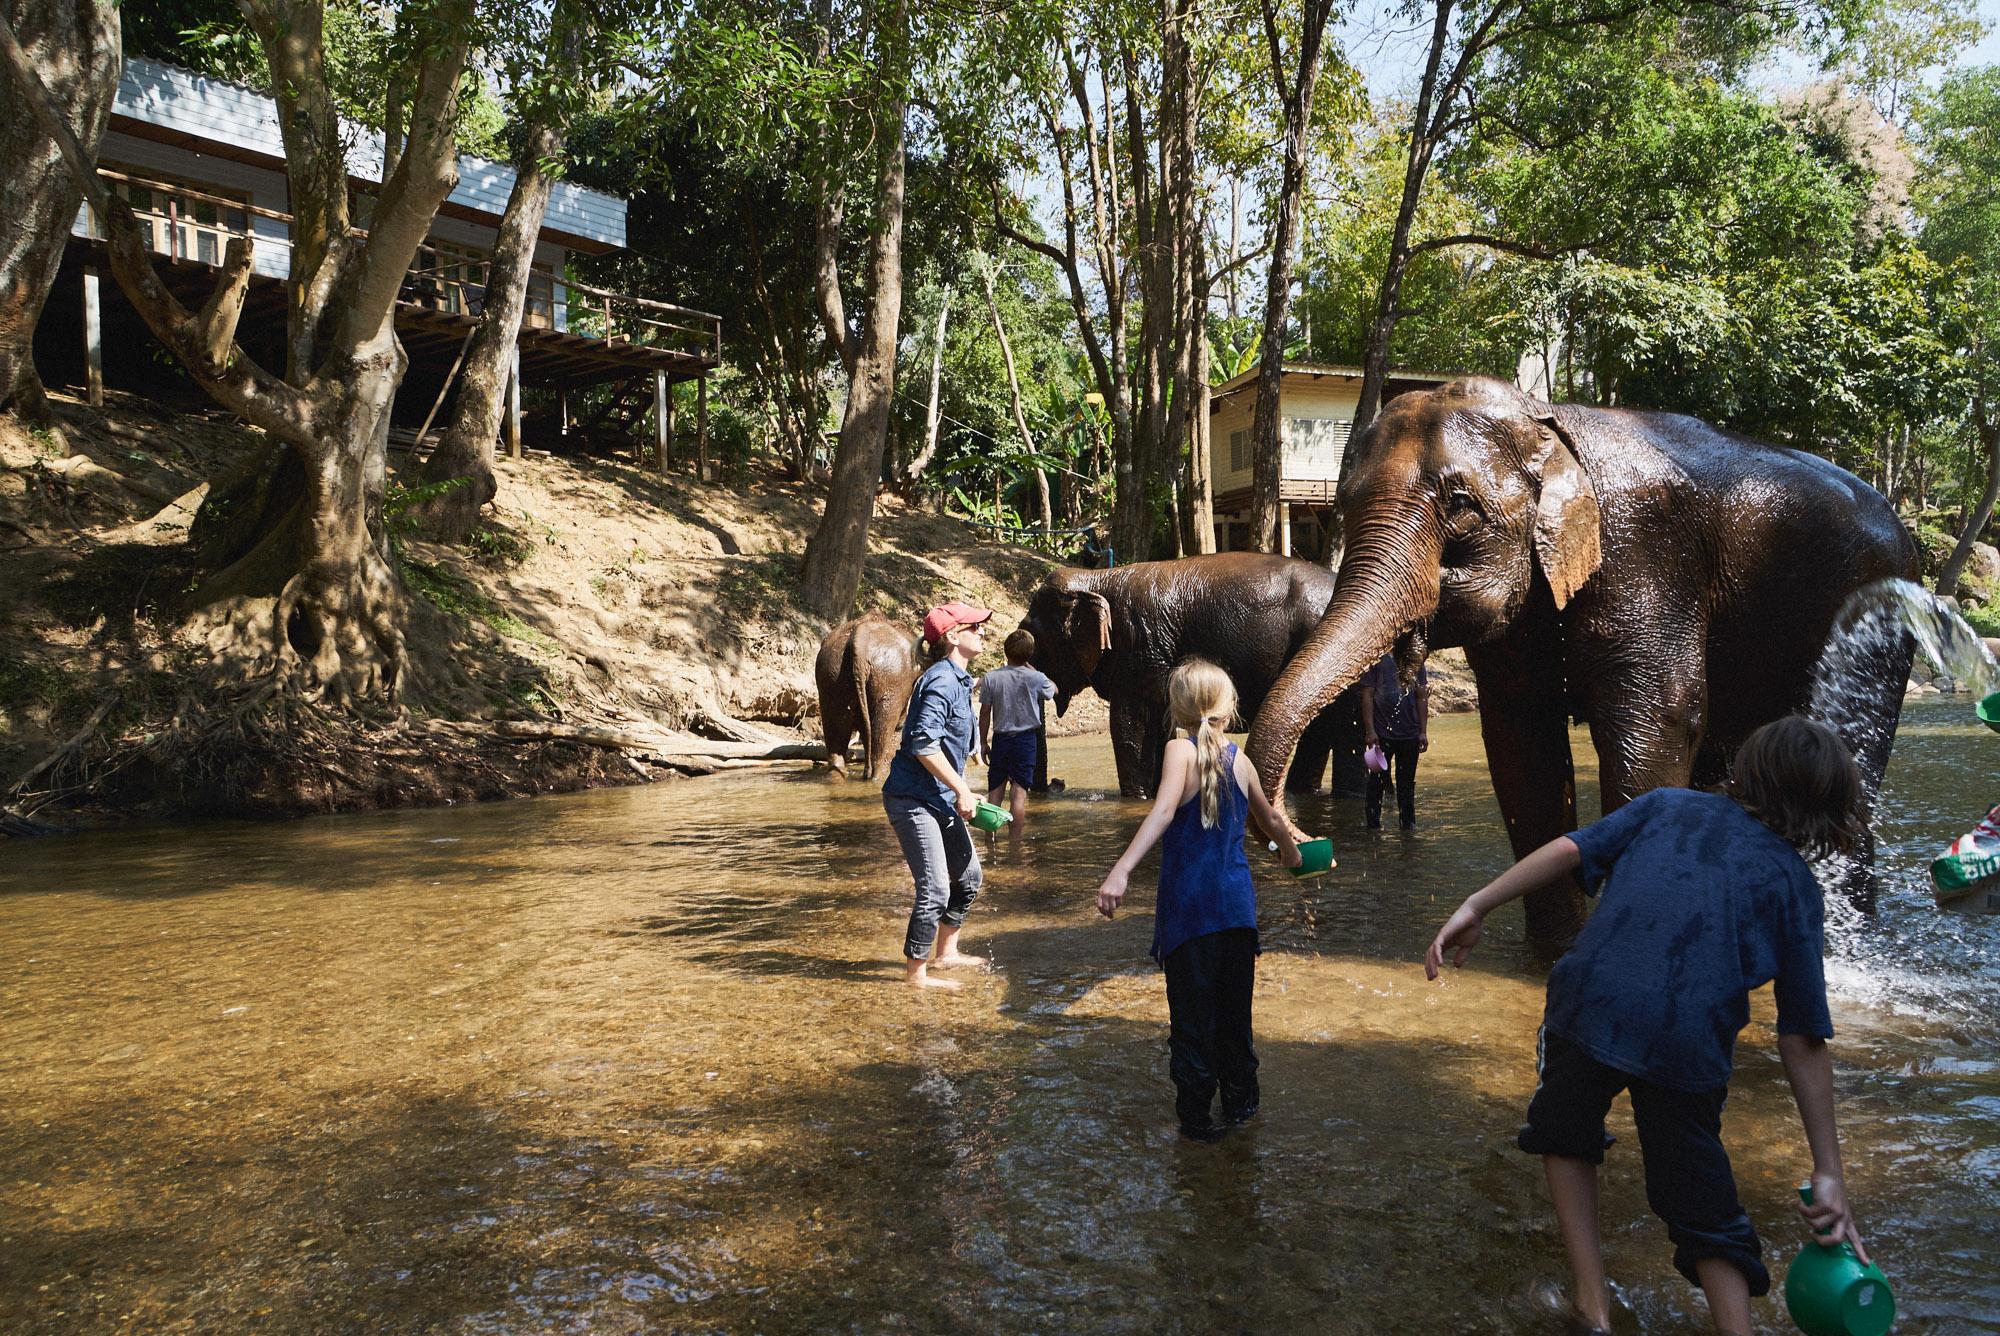 wesley_elephant_park_thailand-30